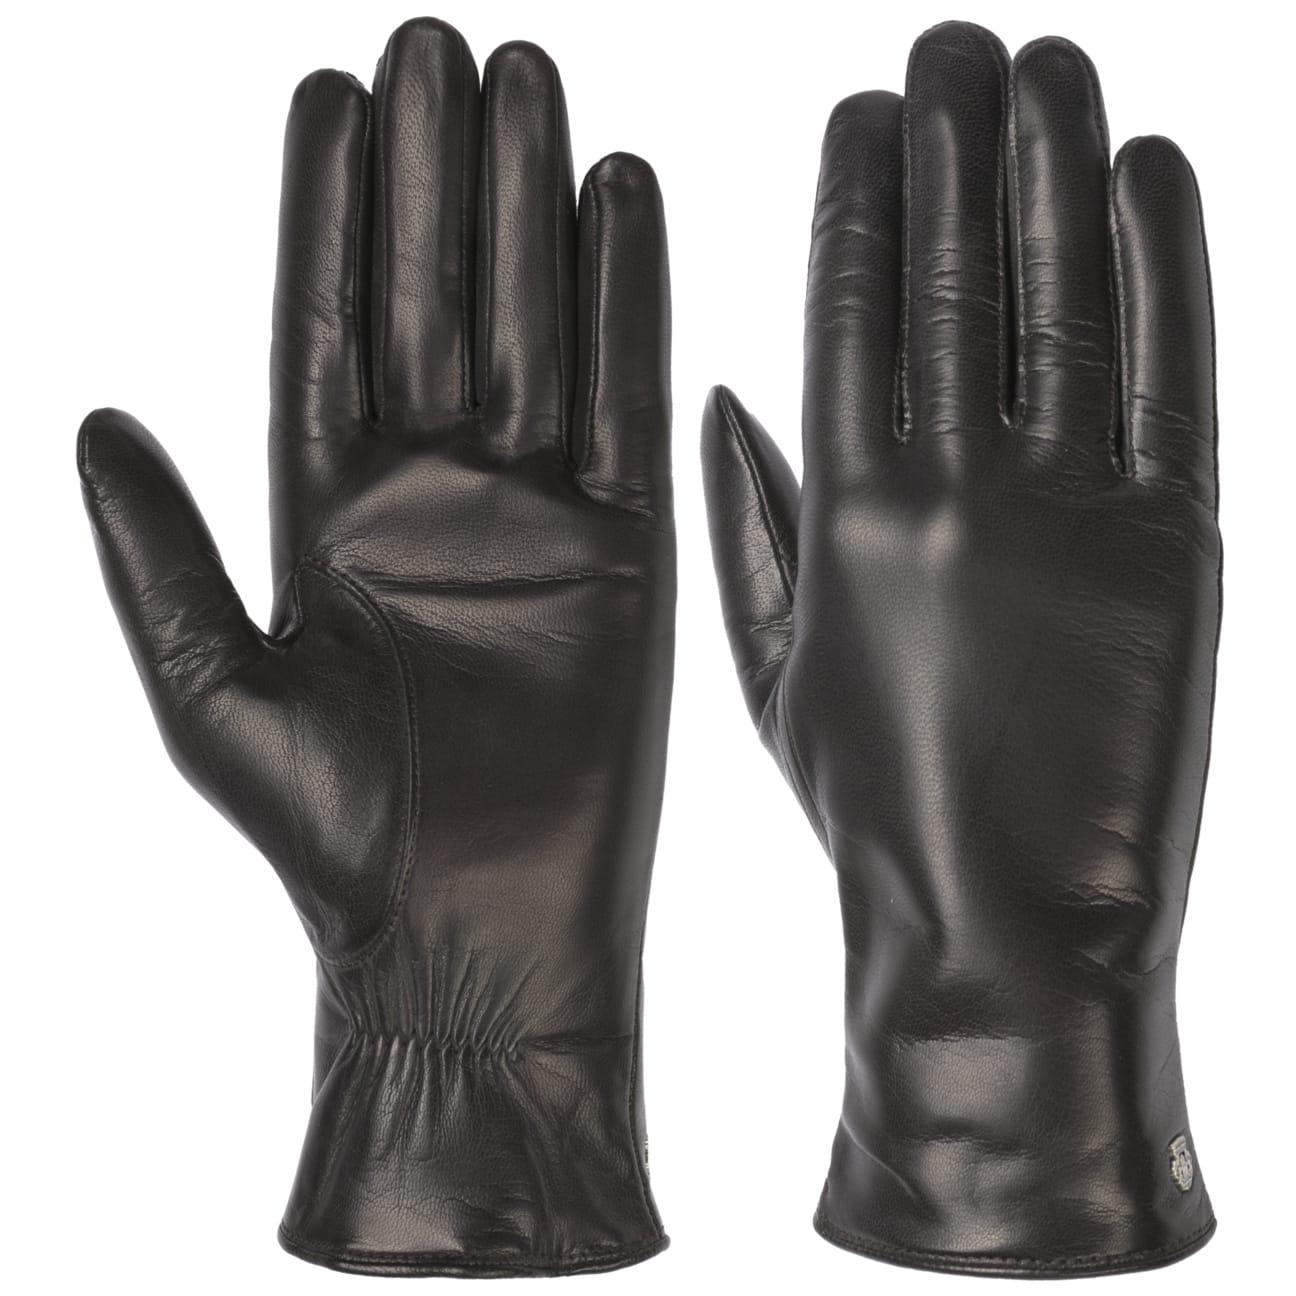 Gants pour Femme Basic by Roeckl  gants avec dogits